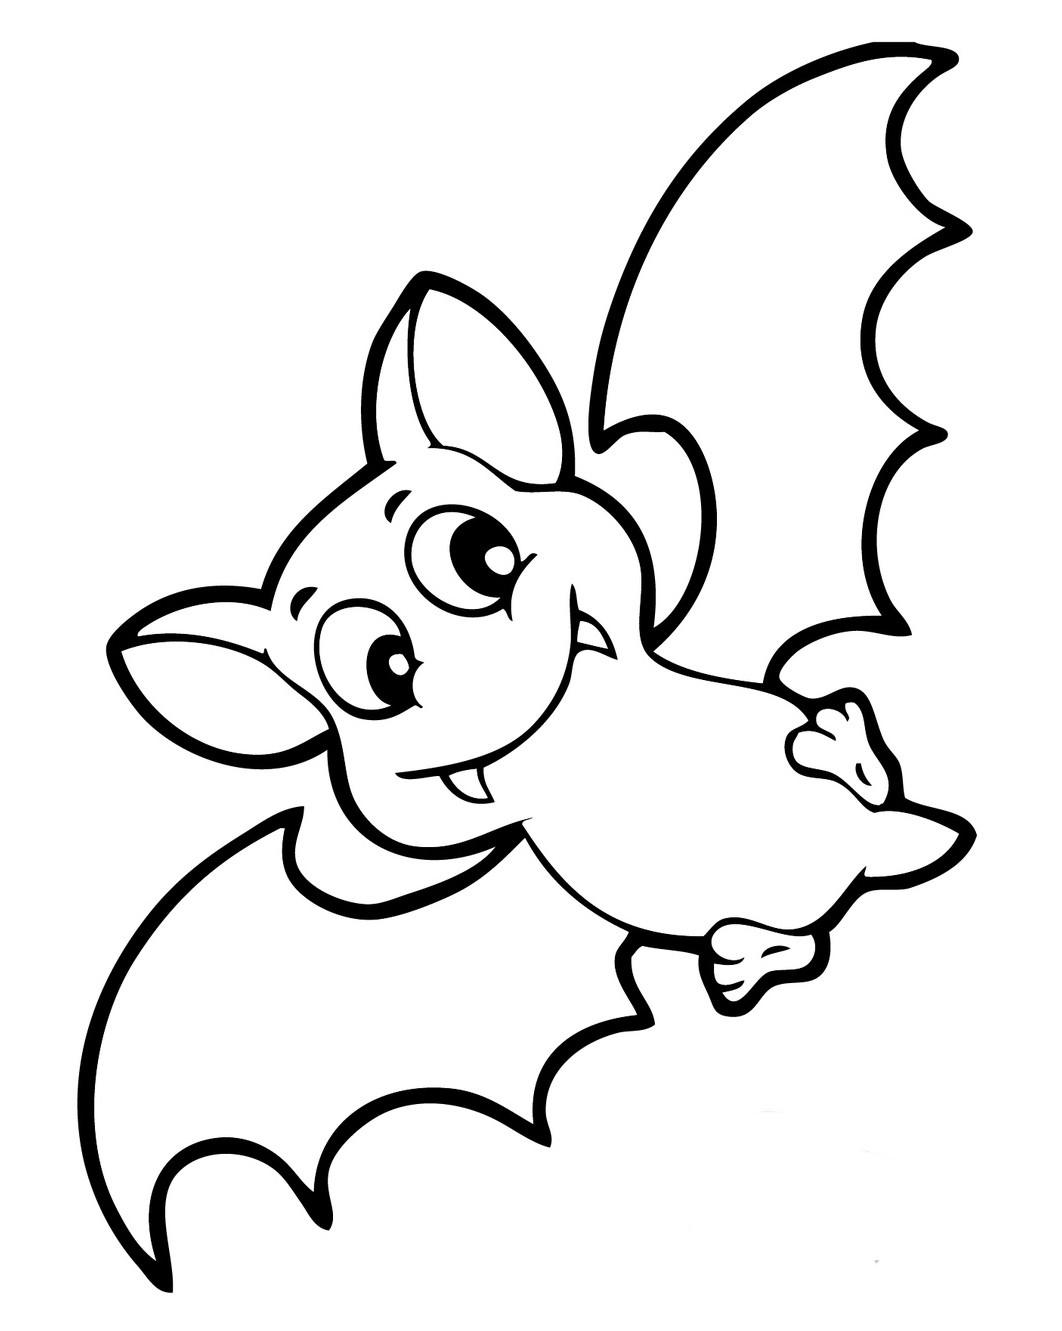 Murciélago sonriente